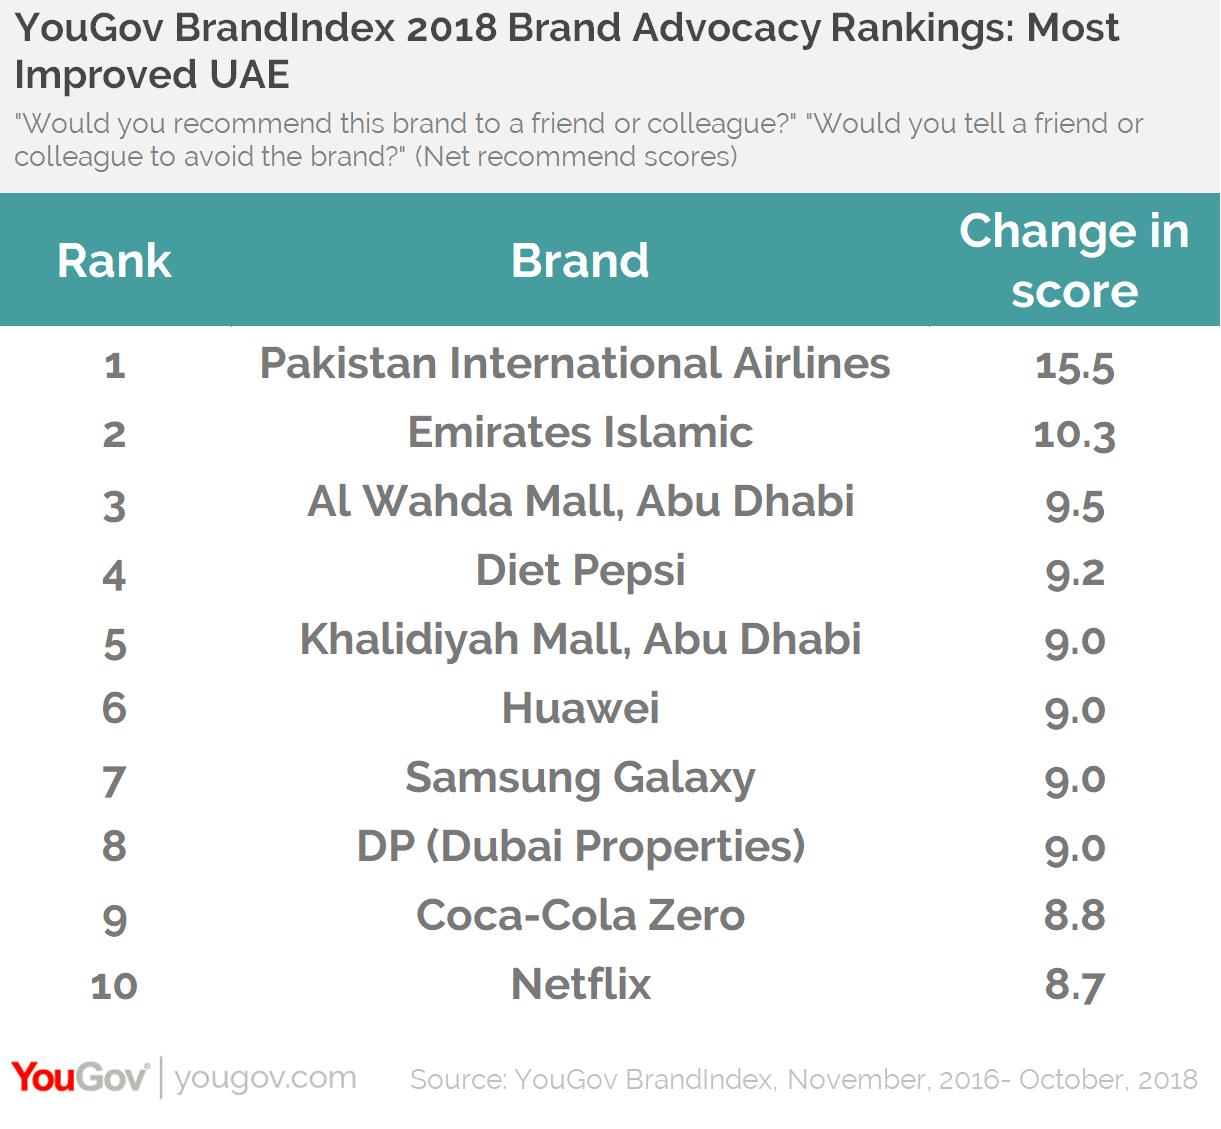 YouGov BrandIndex 2018 Brand Advocacy Rankings- Top 10 UAE